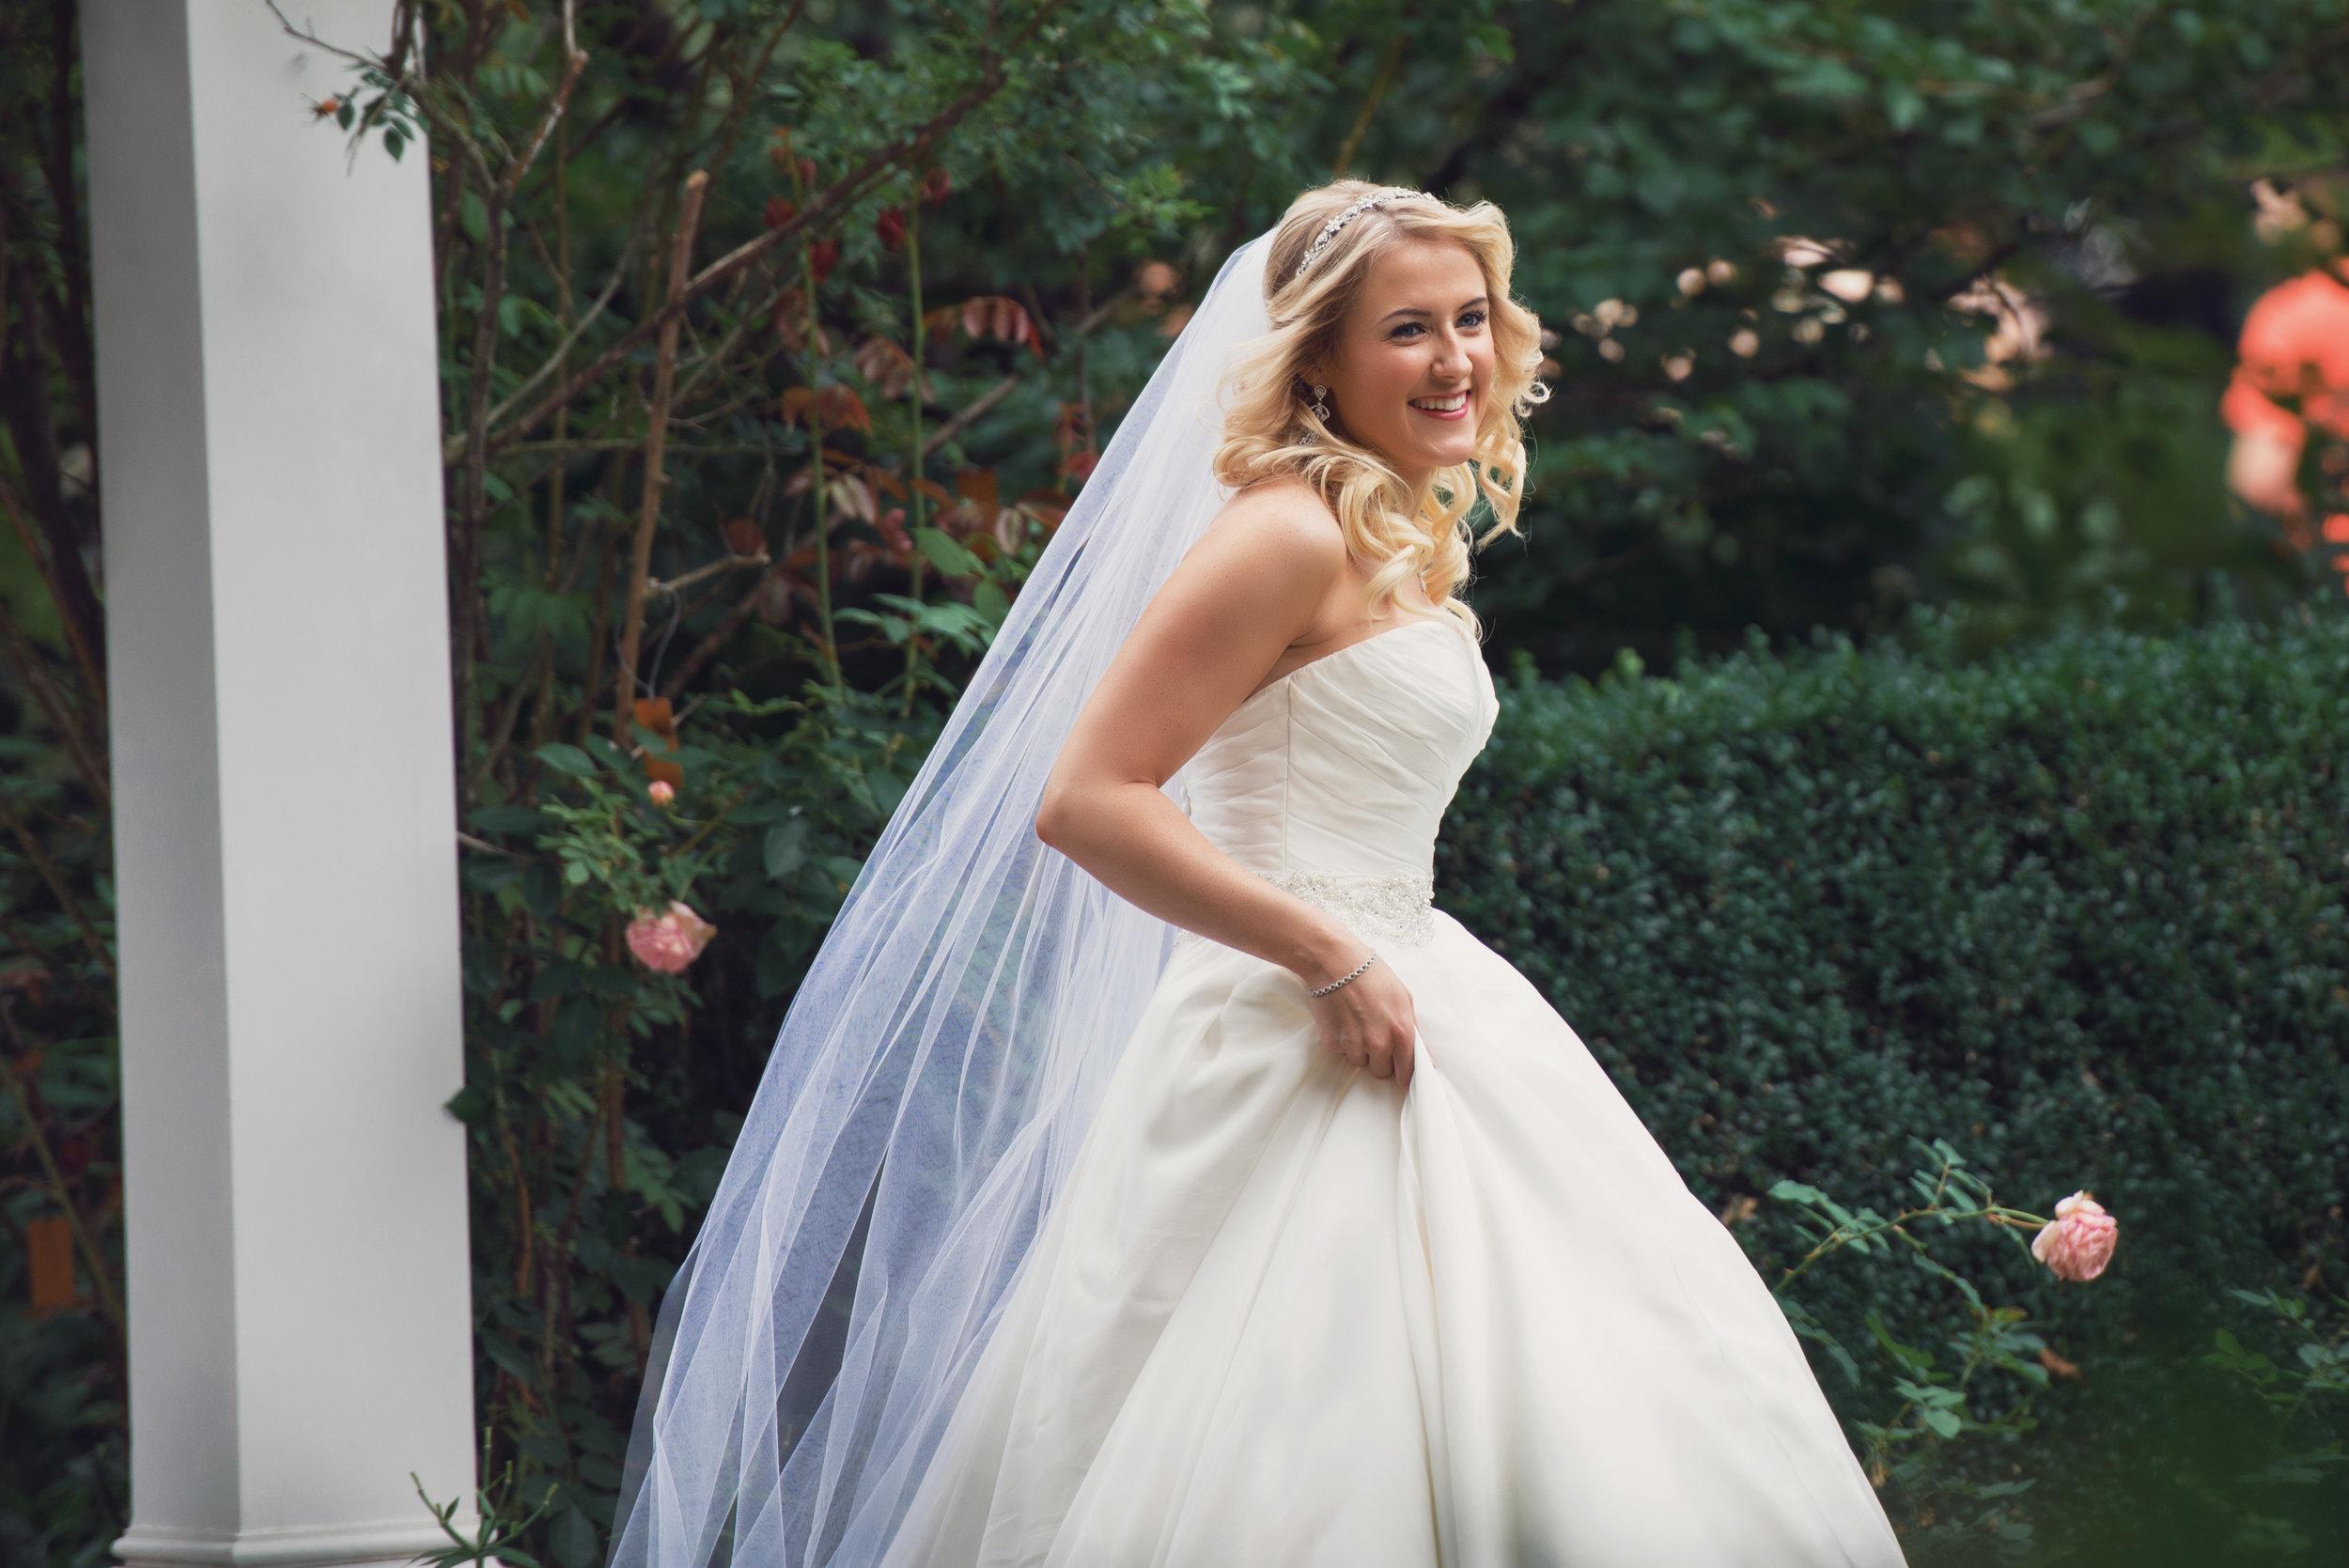 Wedding First Look Photos00914.jpg